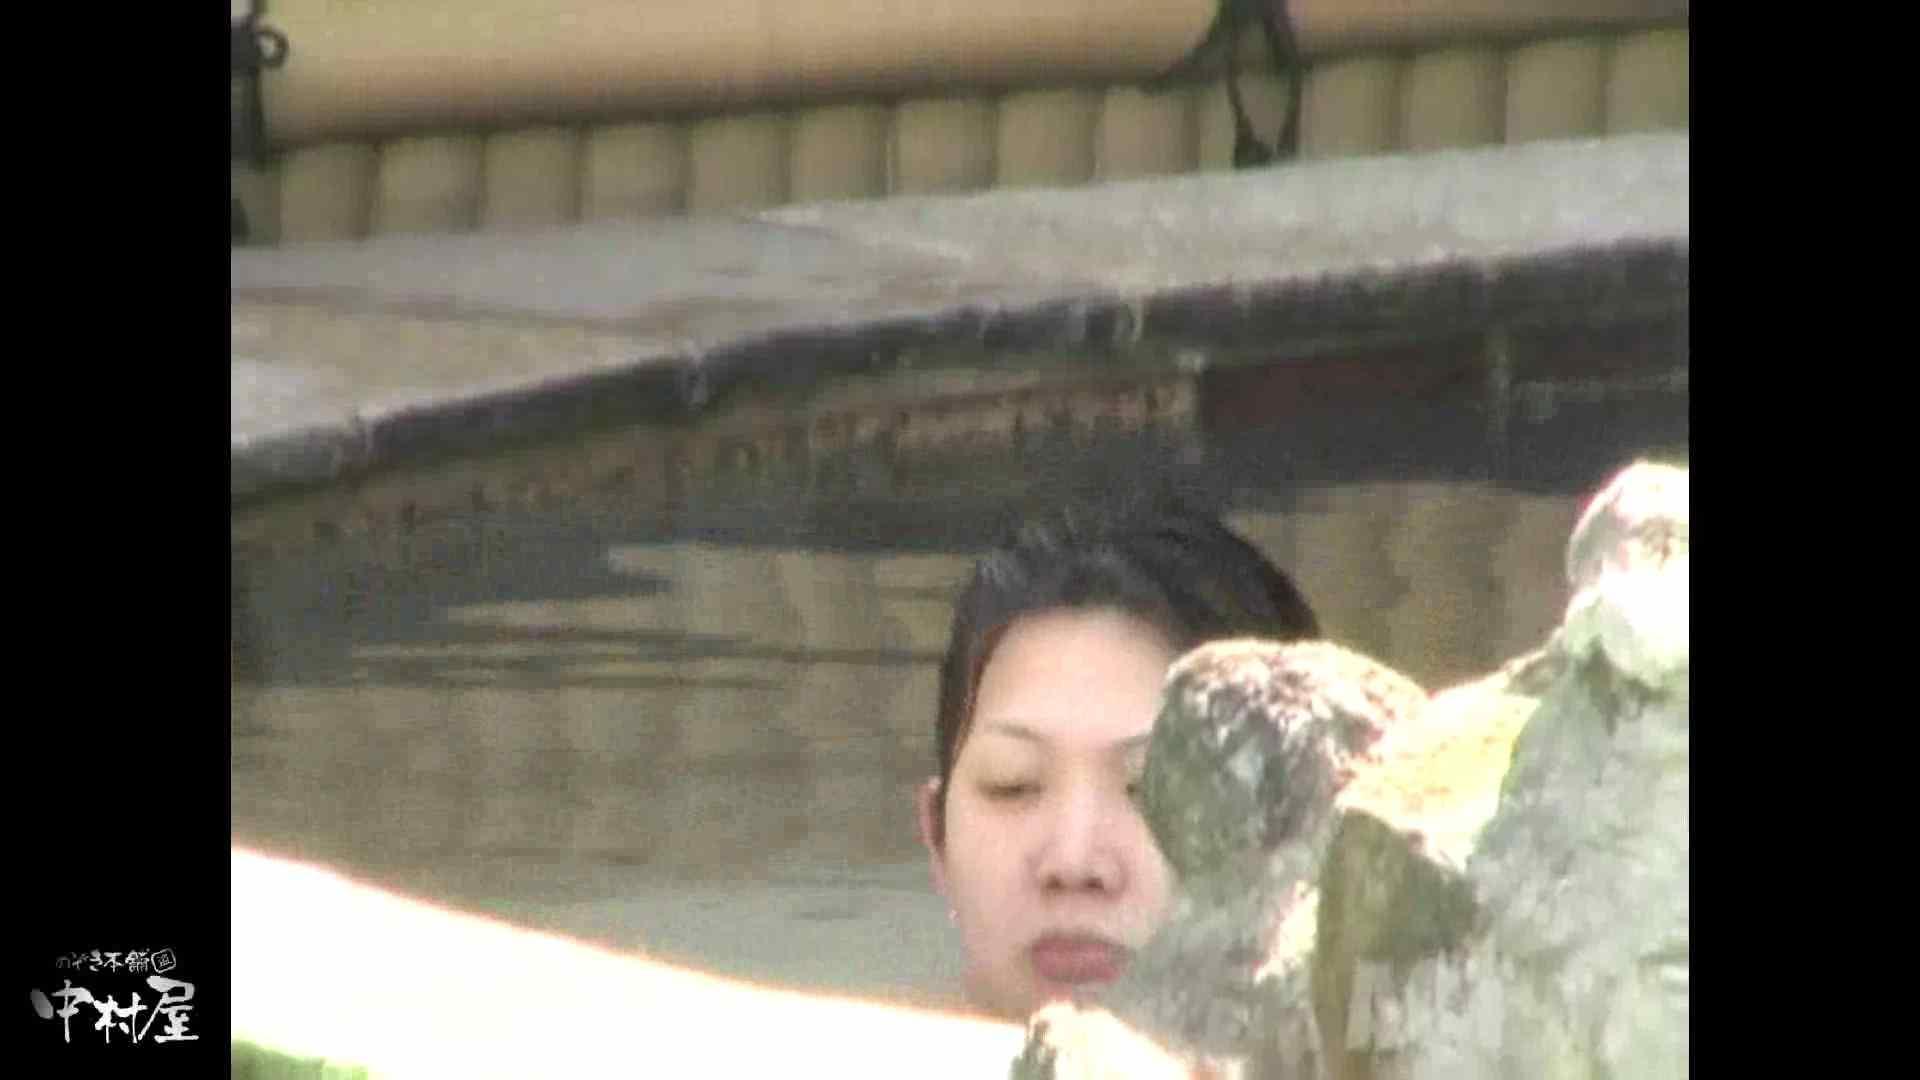 Aquaな露天風呂Vol.881潜入盗撮露天風呂十七判湯 其の三 盗撮 AV動画キャプチャ 72画像 30